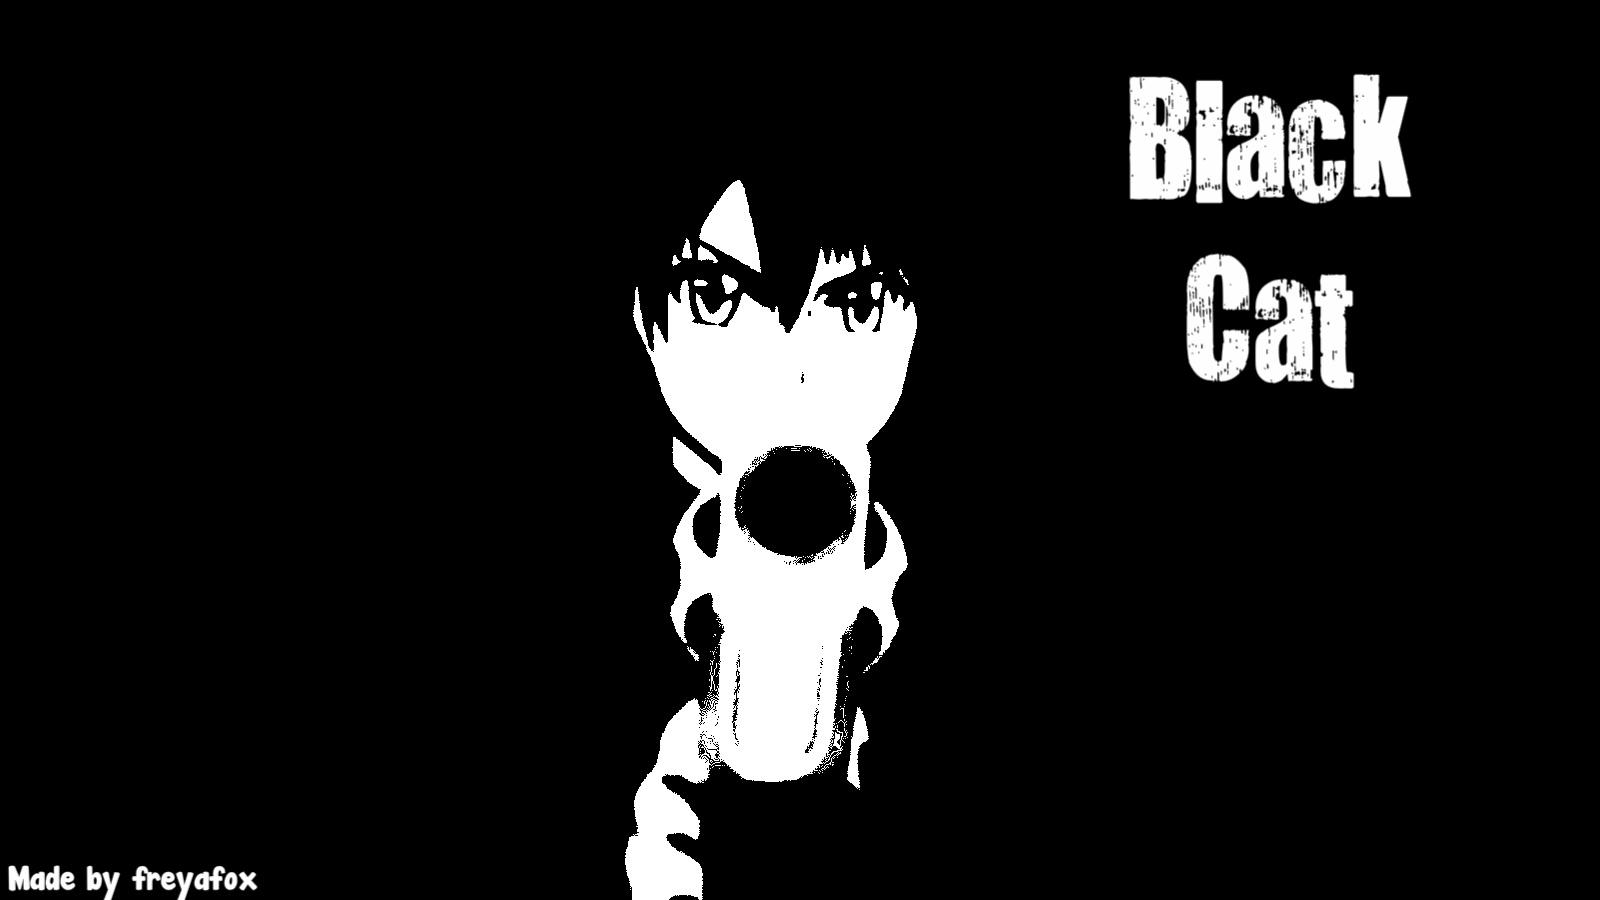 Free Download Black Cat Images Black Cat Wallpaper Hd Wallpaper And Background 1600x900 For Your Desktop Mobile Tablet Explore 29 Black Cat Anime Wallpapers Black Cat Anime Wallpaper Black